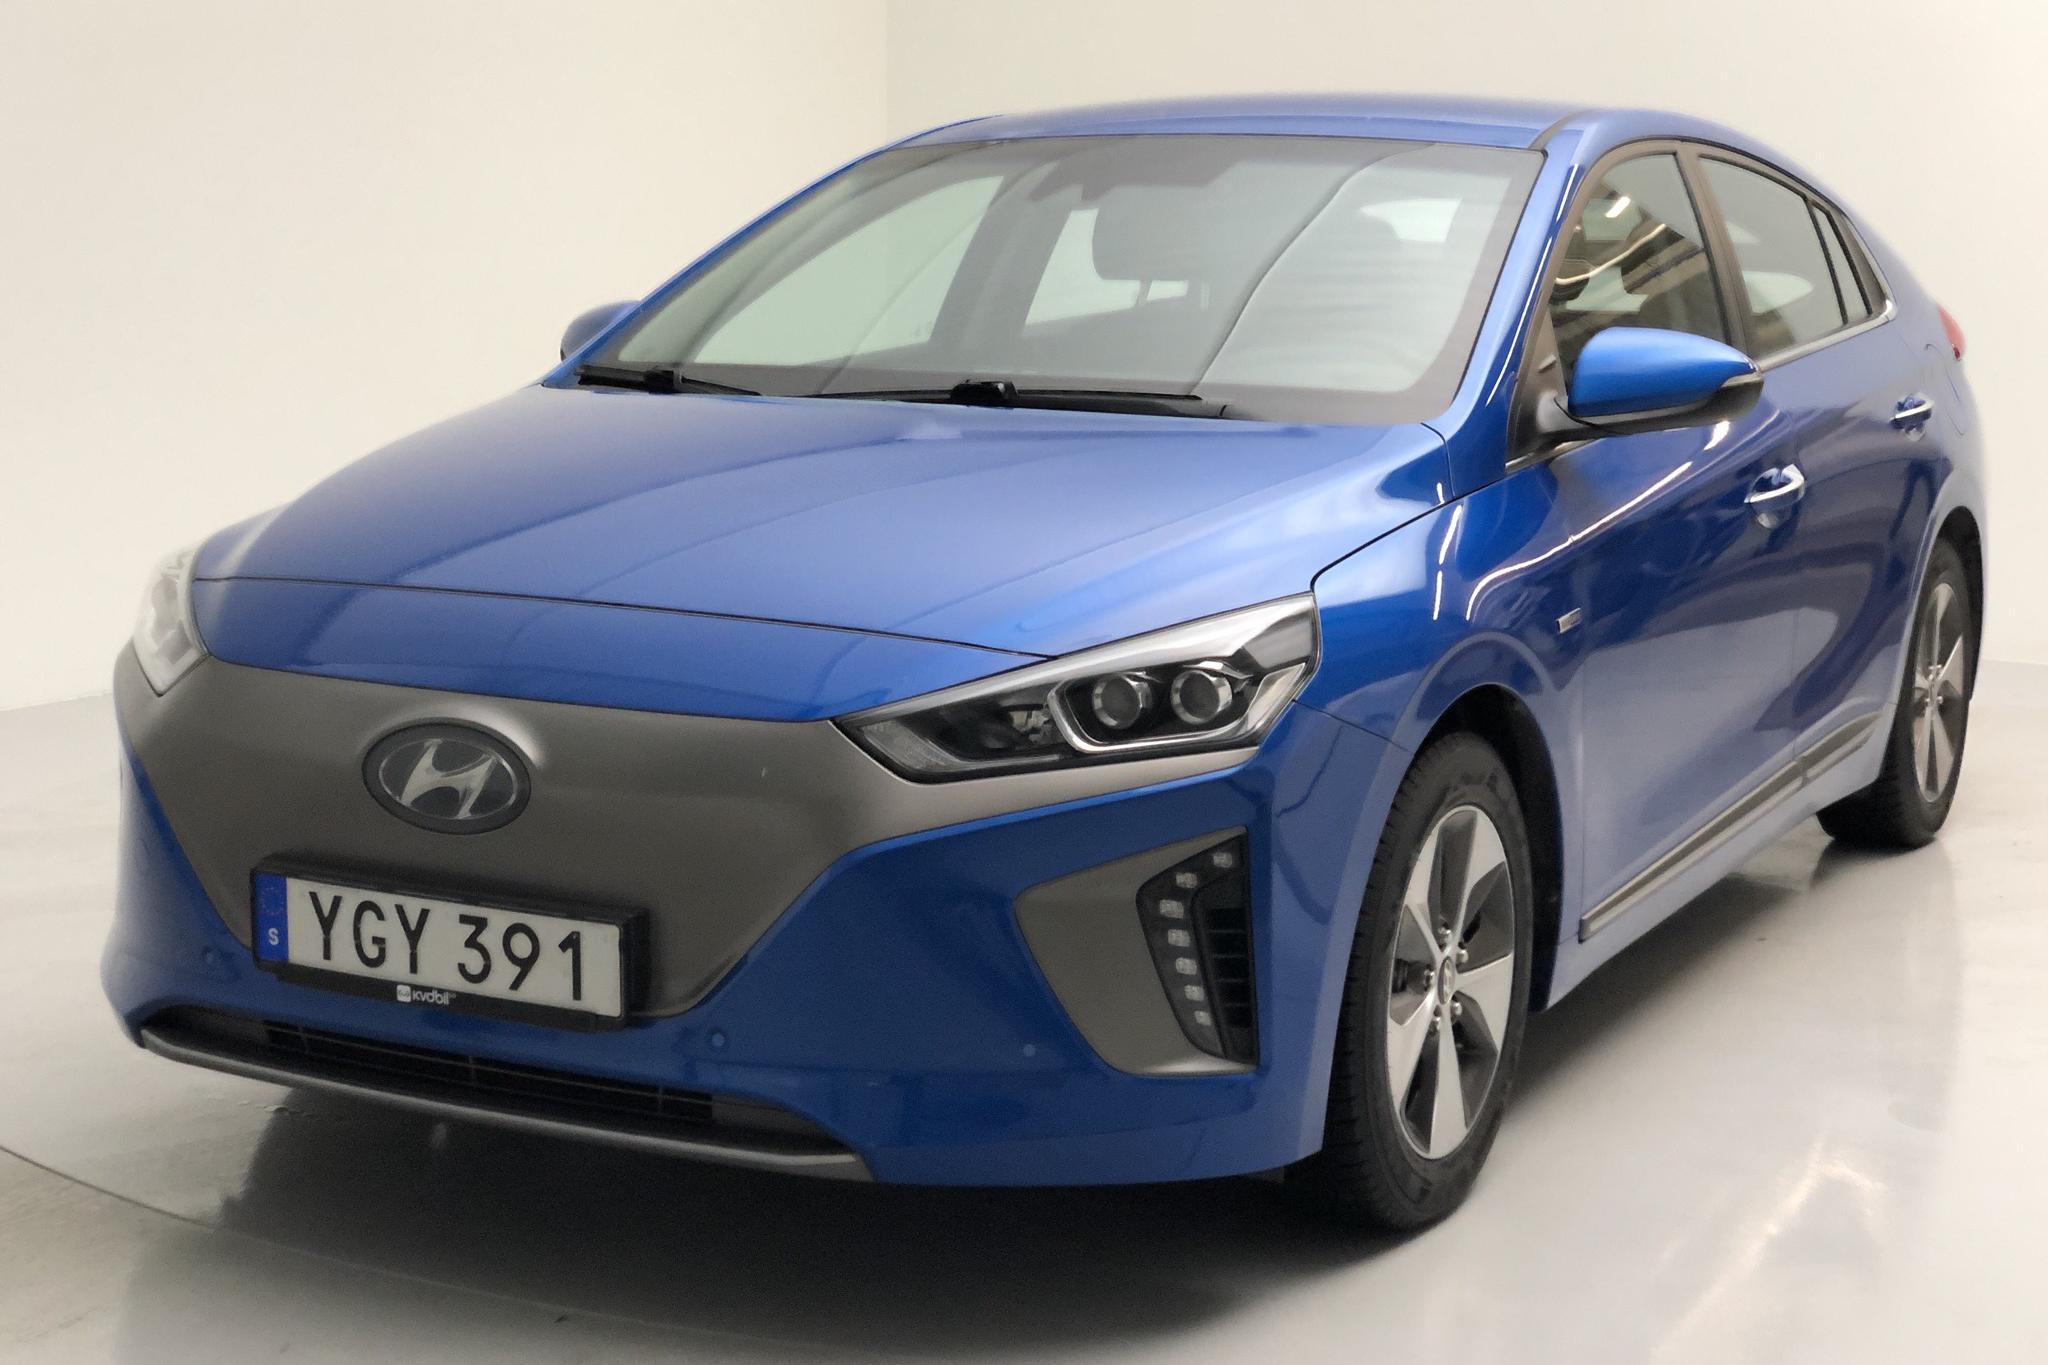 Hyundai IONIQ Electric (120hk) - 60 670 km - Automatic - Dark Blue - 2017